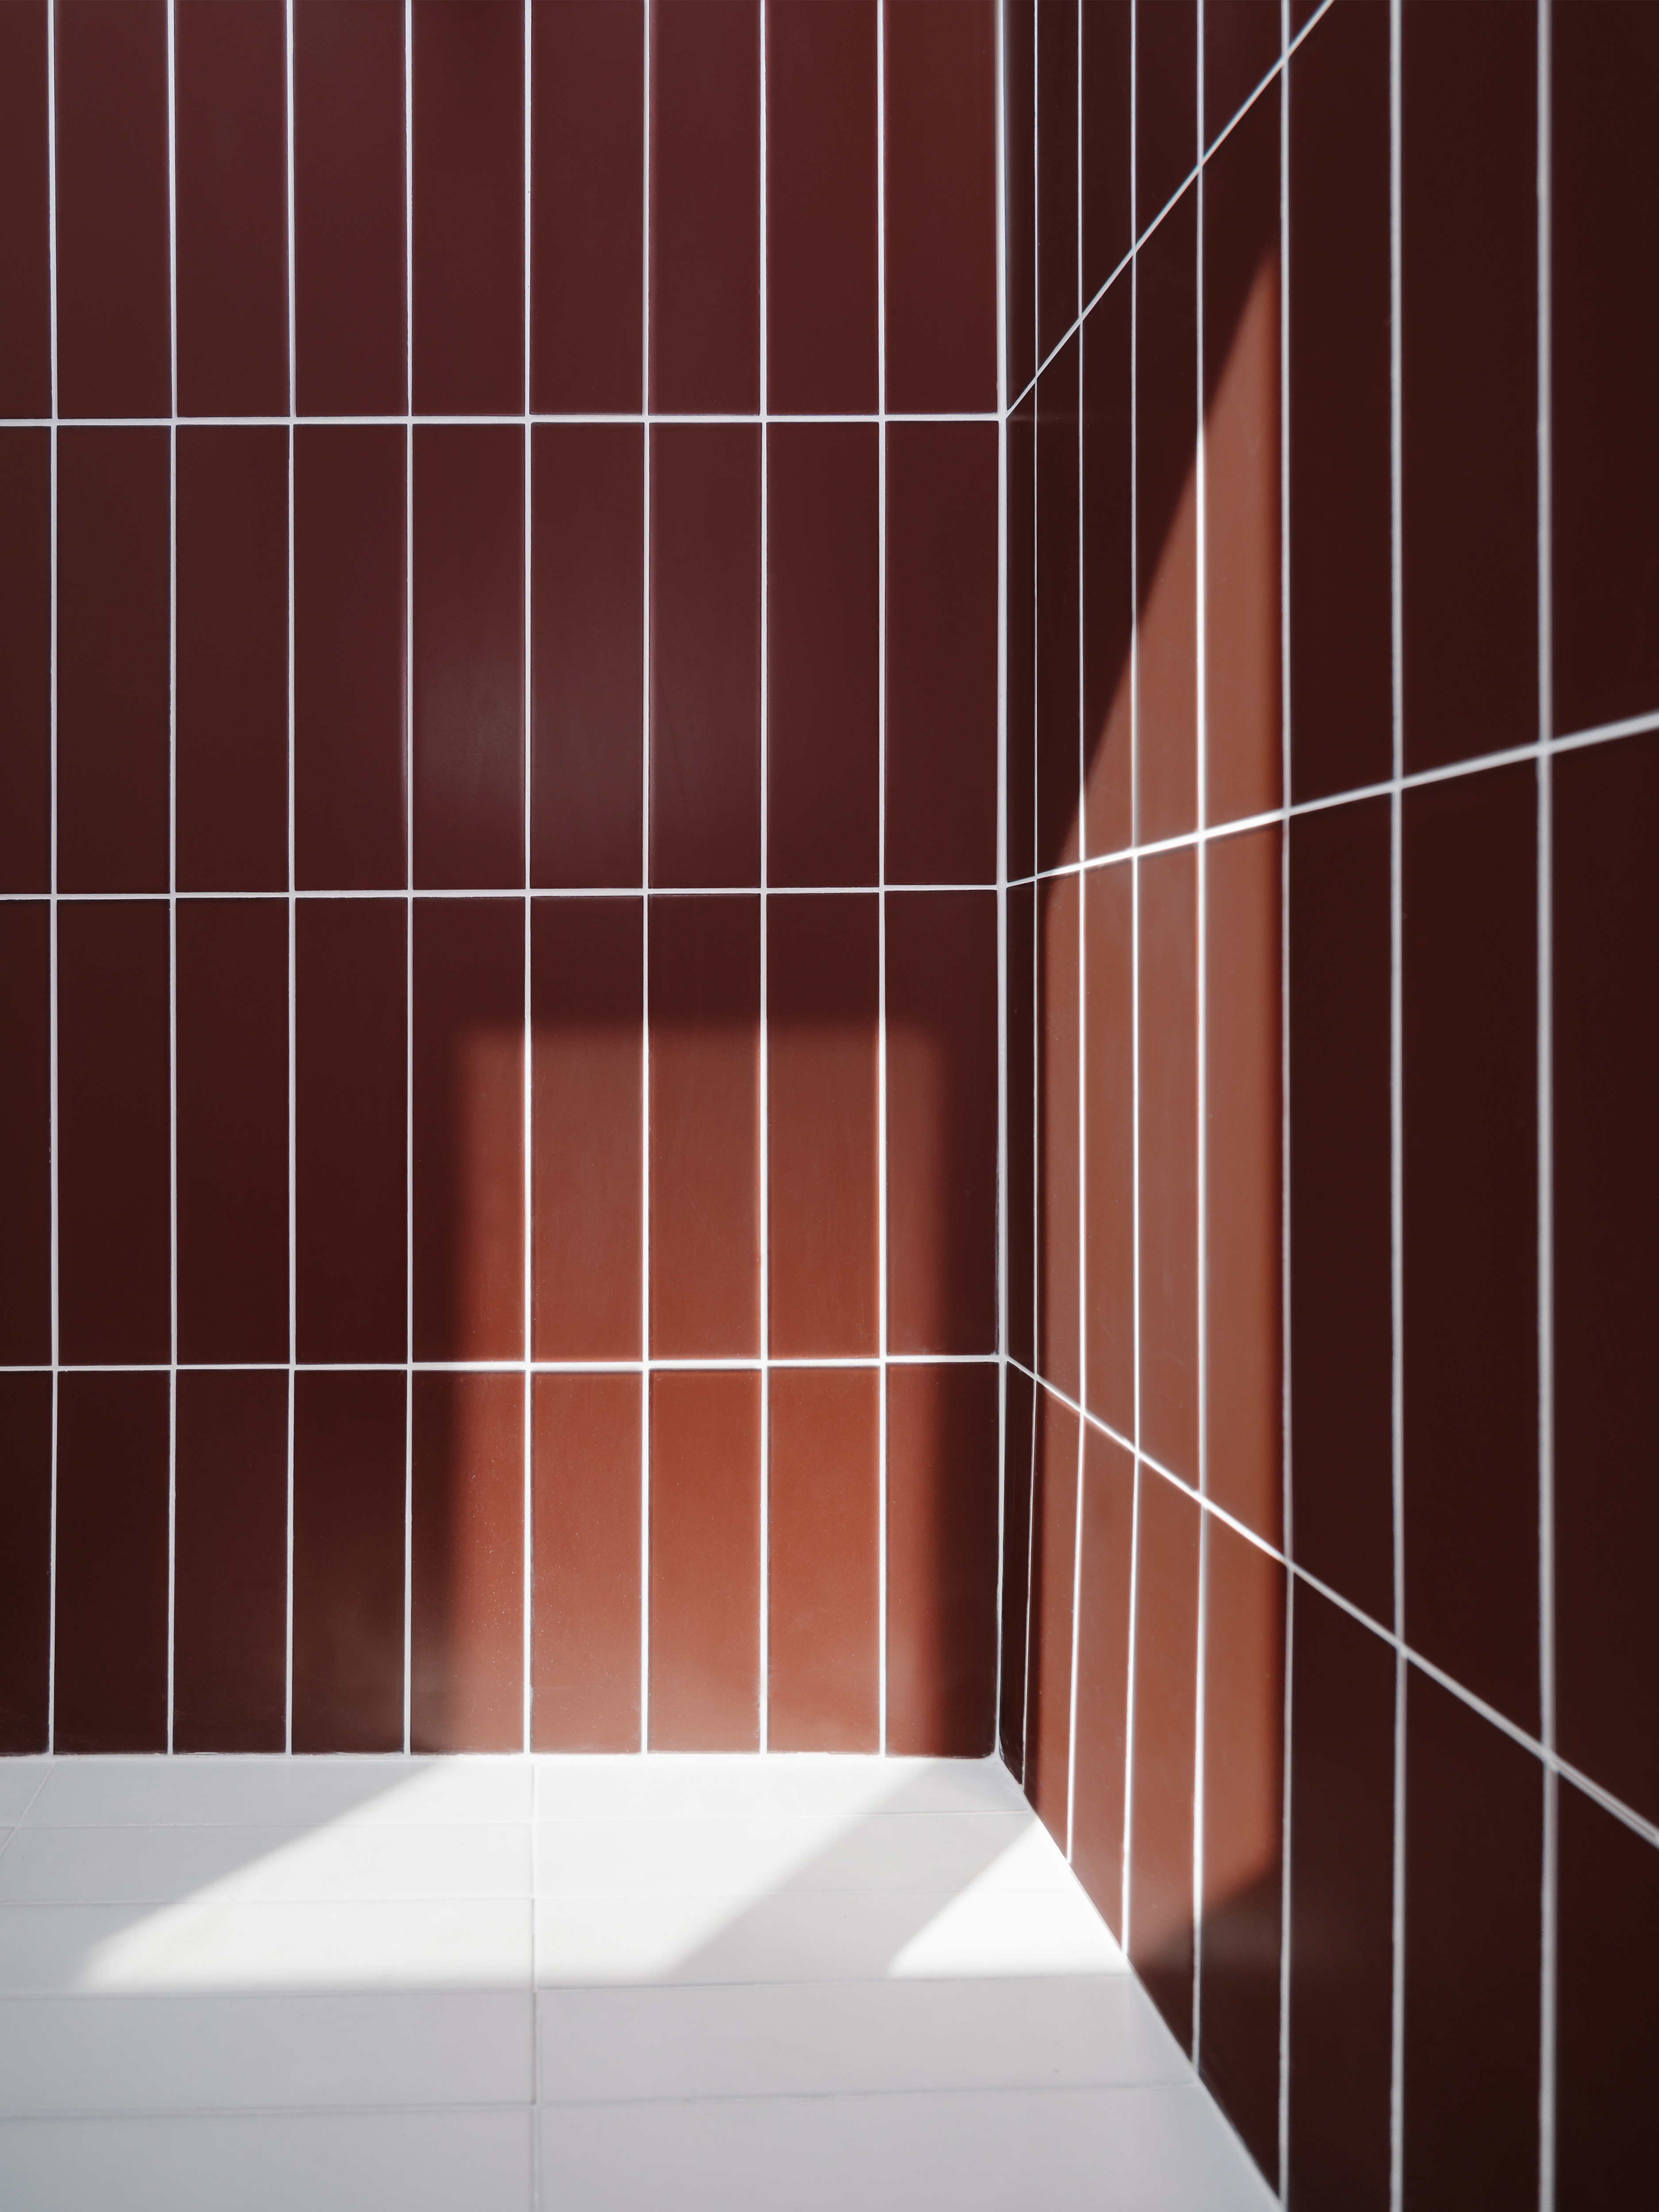 BLOG-2019_Q2_image_residential_full-rights_influencer_design_photo_chase-daniel_bathroom_shower_walls_glass_pheasant-matte_sparrow-matte_3x12_floor_tile_3x12_halite_vertical_straight-set_detail_FC-263094_FC-263091.jpg?mtime=20190508155004#asset:451625